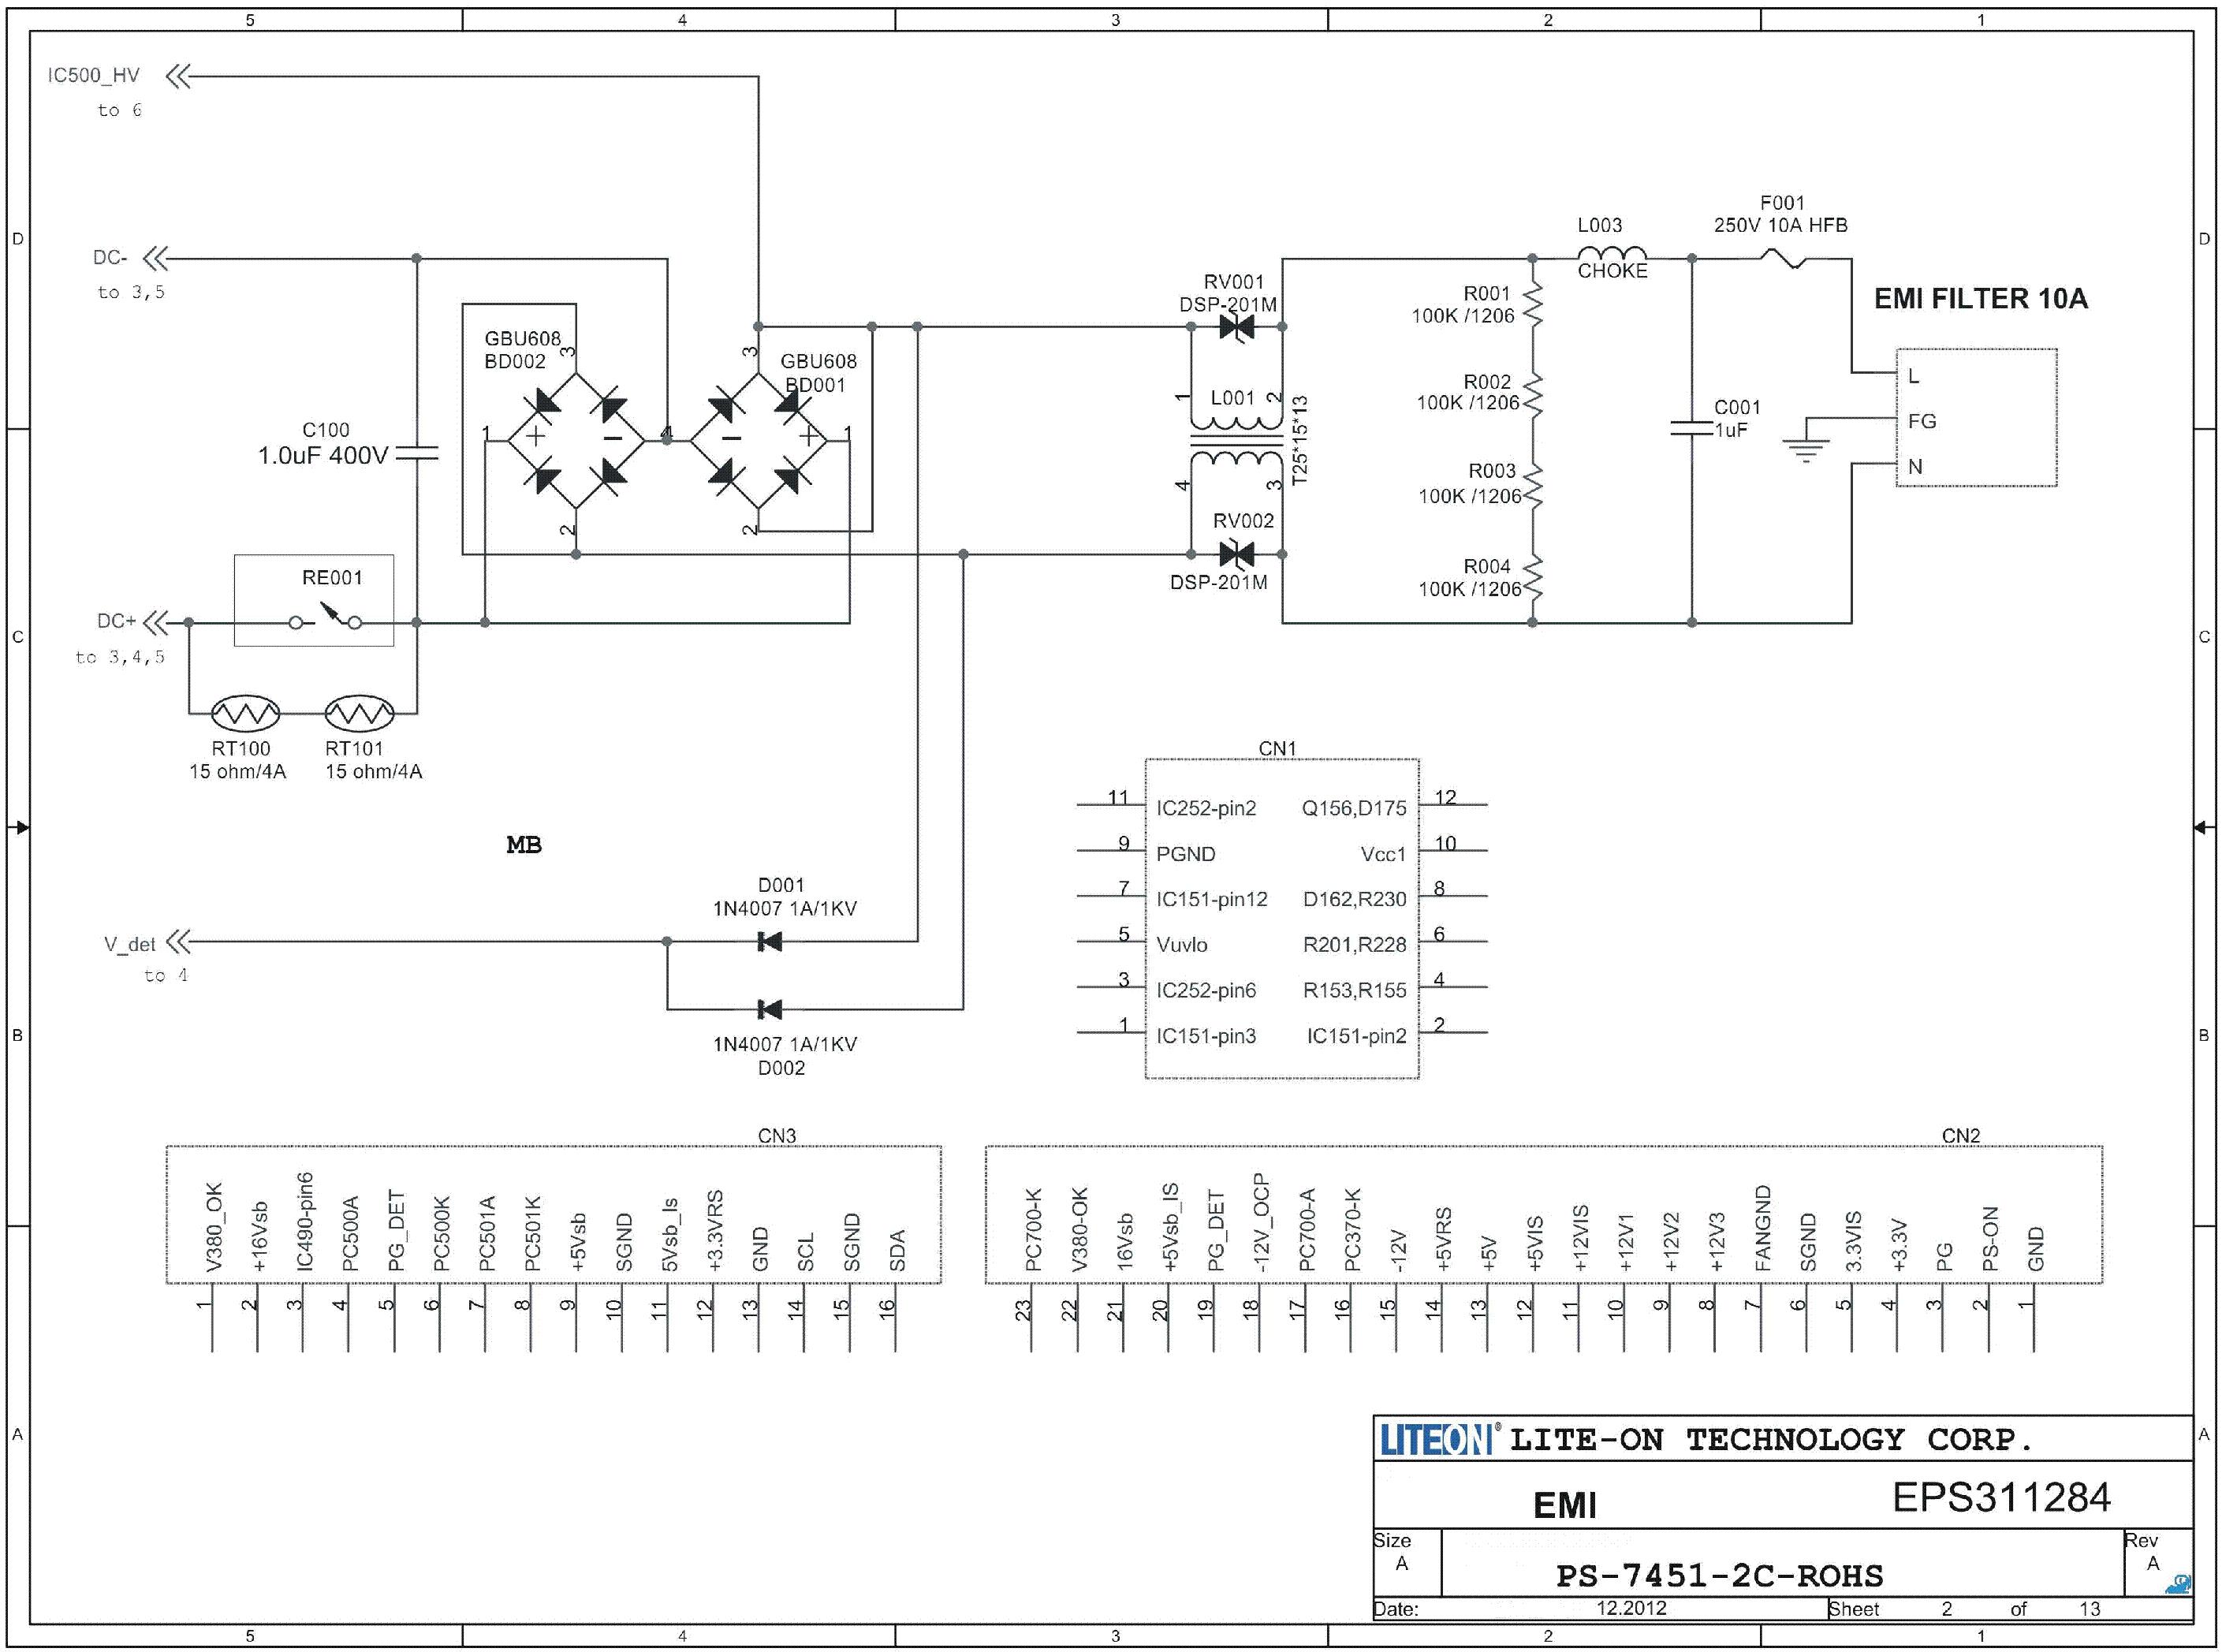 Liteon Ps-5301-08Ha Wiring Diagram from elektrotanya.com